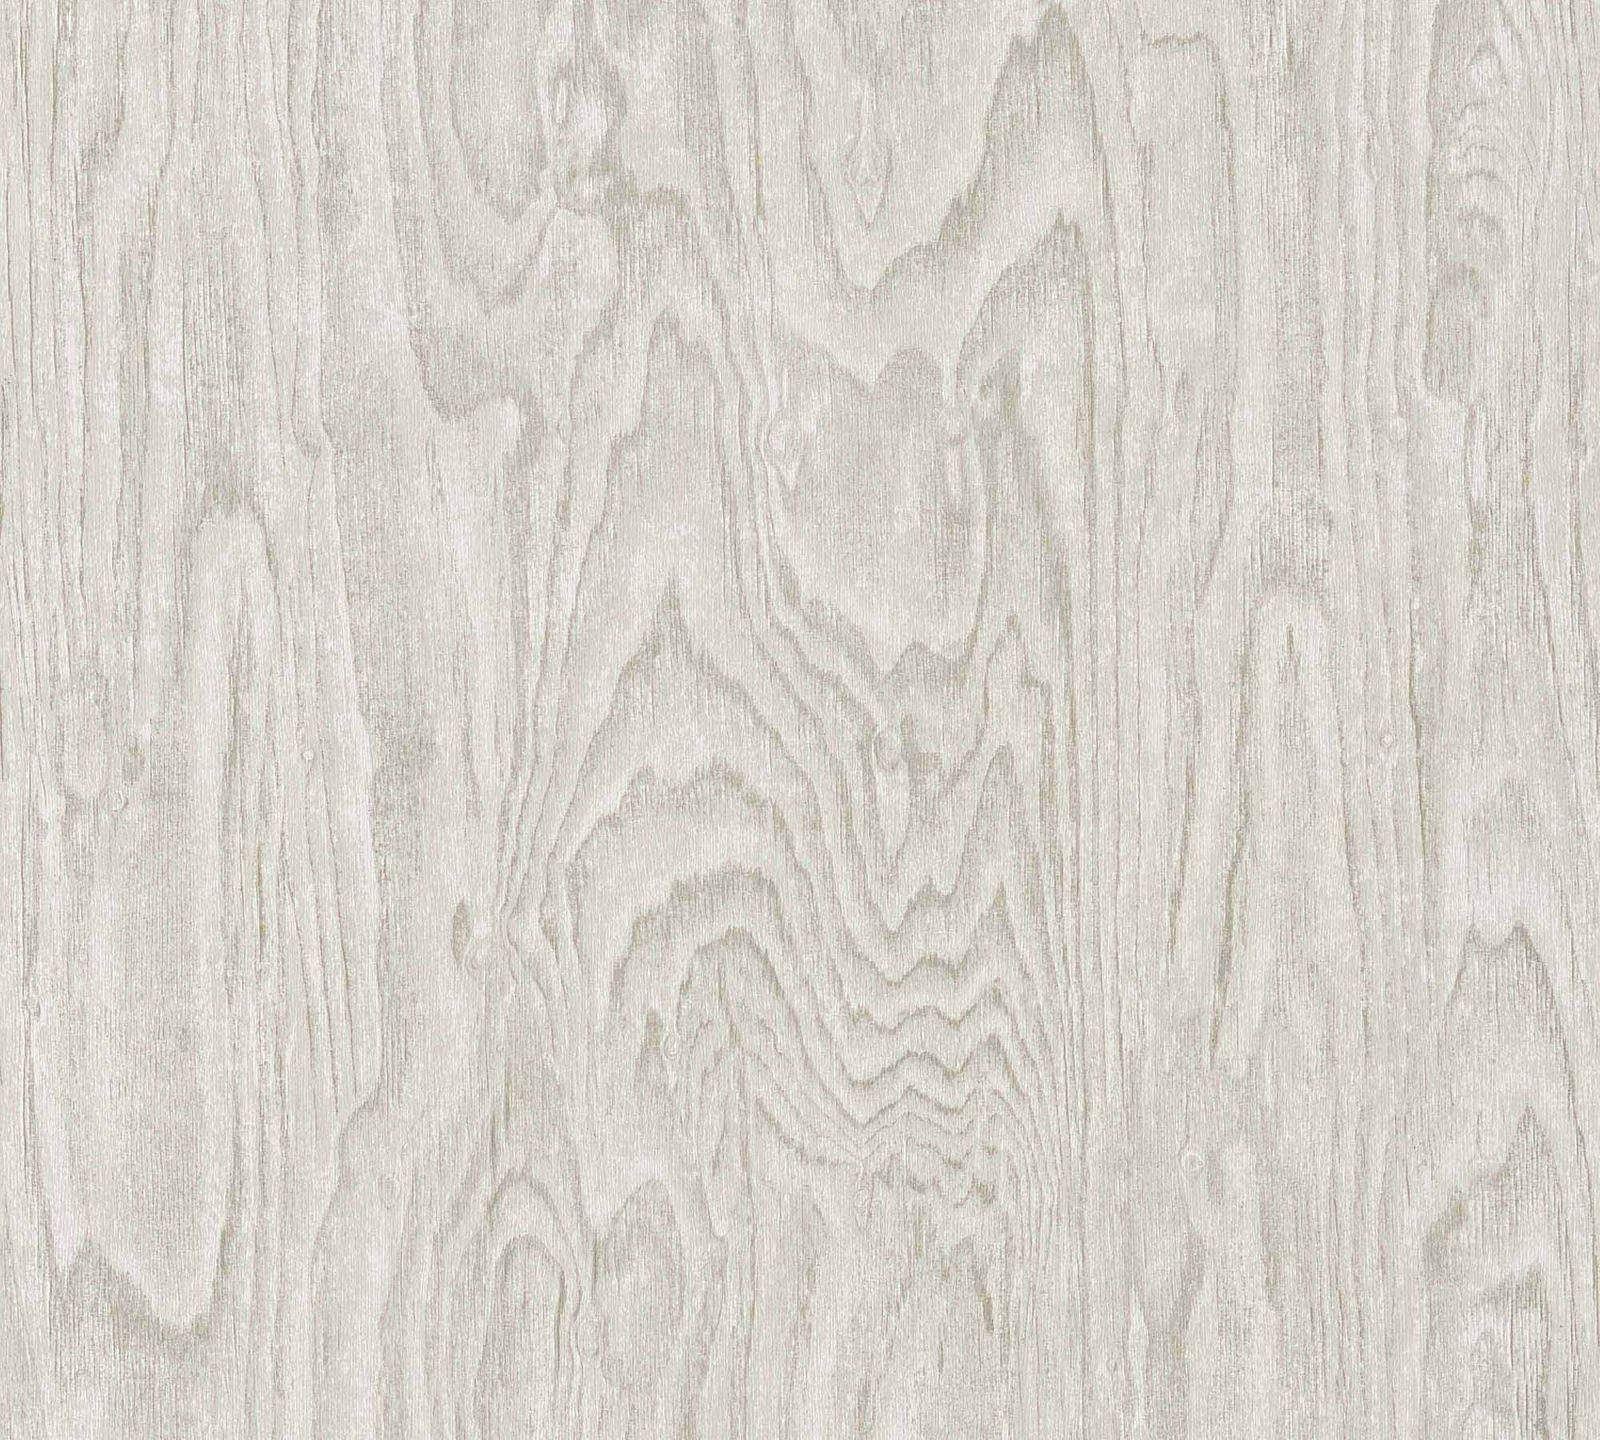 Vlies Tapete Holzmaserung Grau Weiss As Creation 36332 1